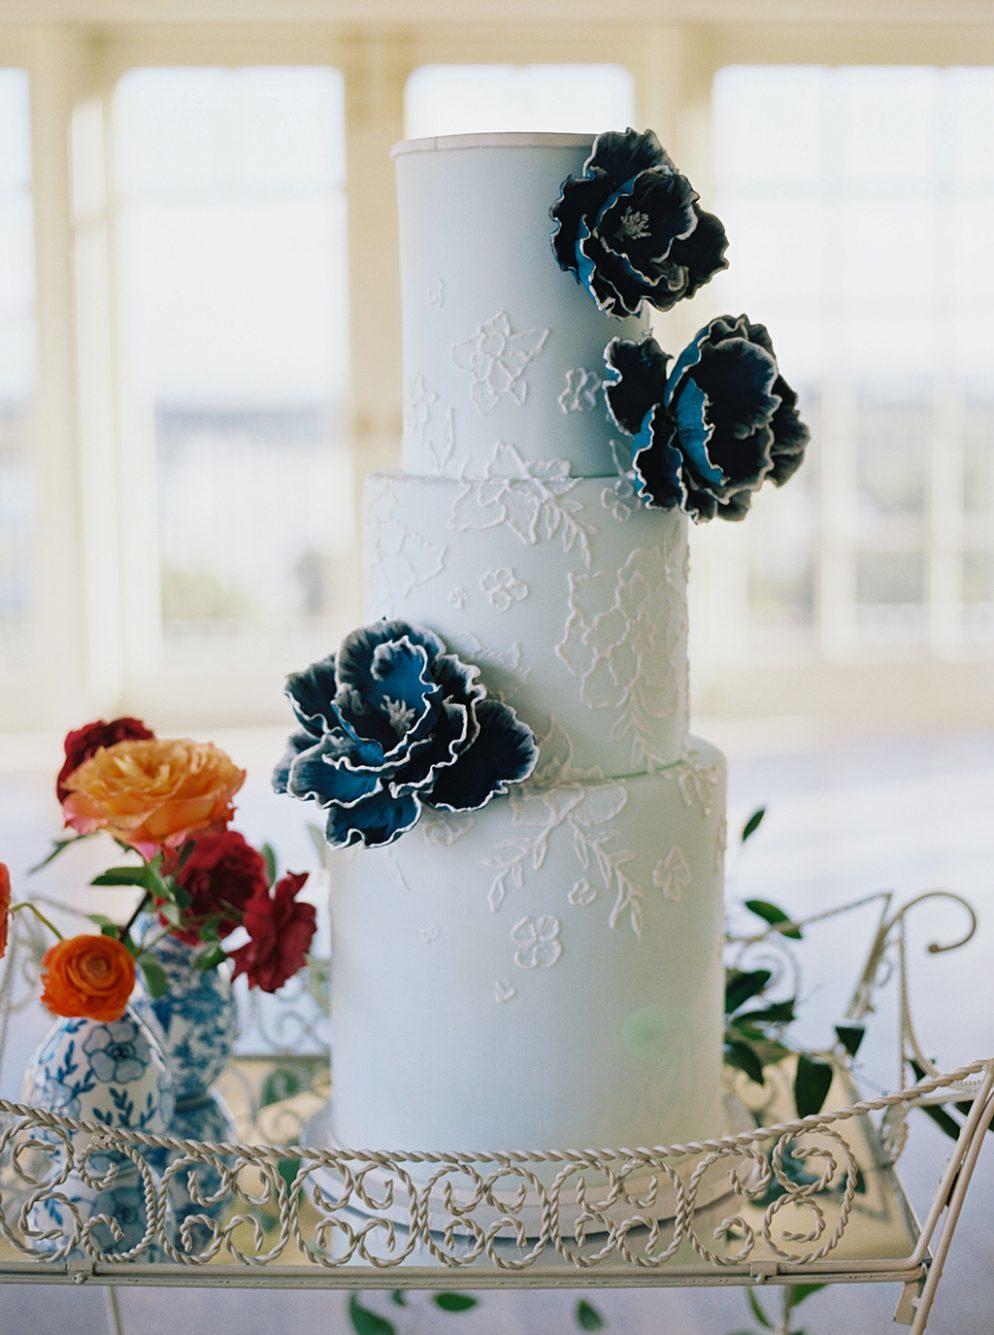 Caroline-Elizabeth-Ross-Ryan-Canfield-Lauren-Balingit30-994x1335